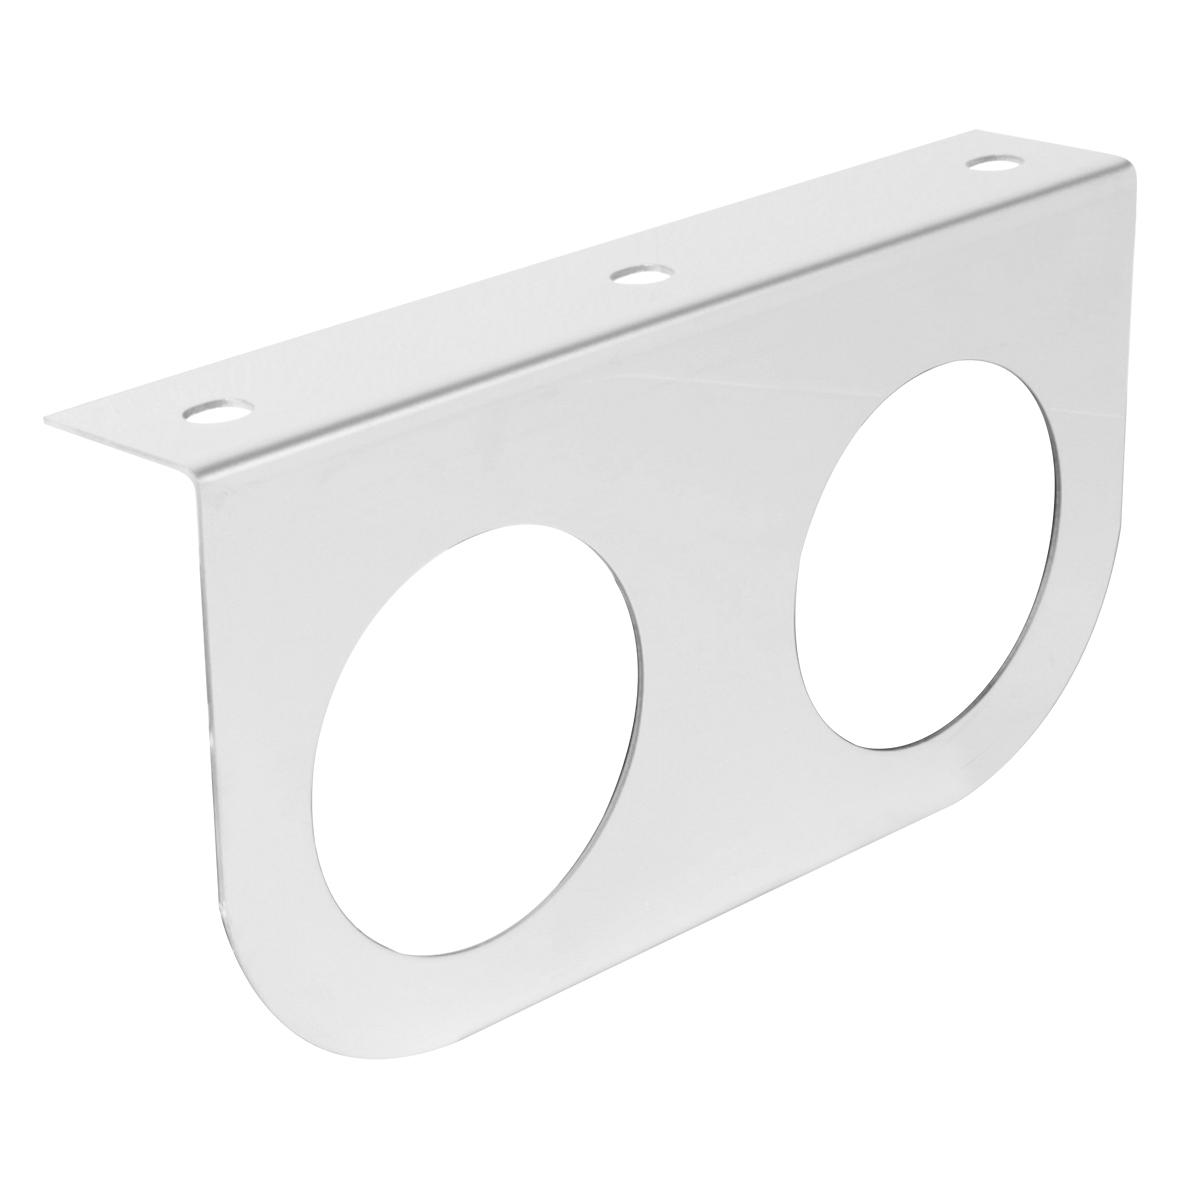 #86459 Stainless Steel Light Bracket Only